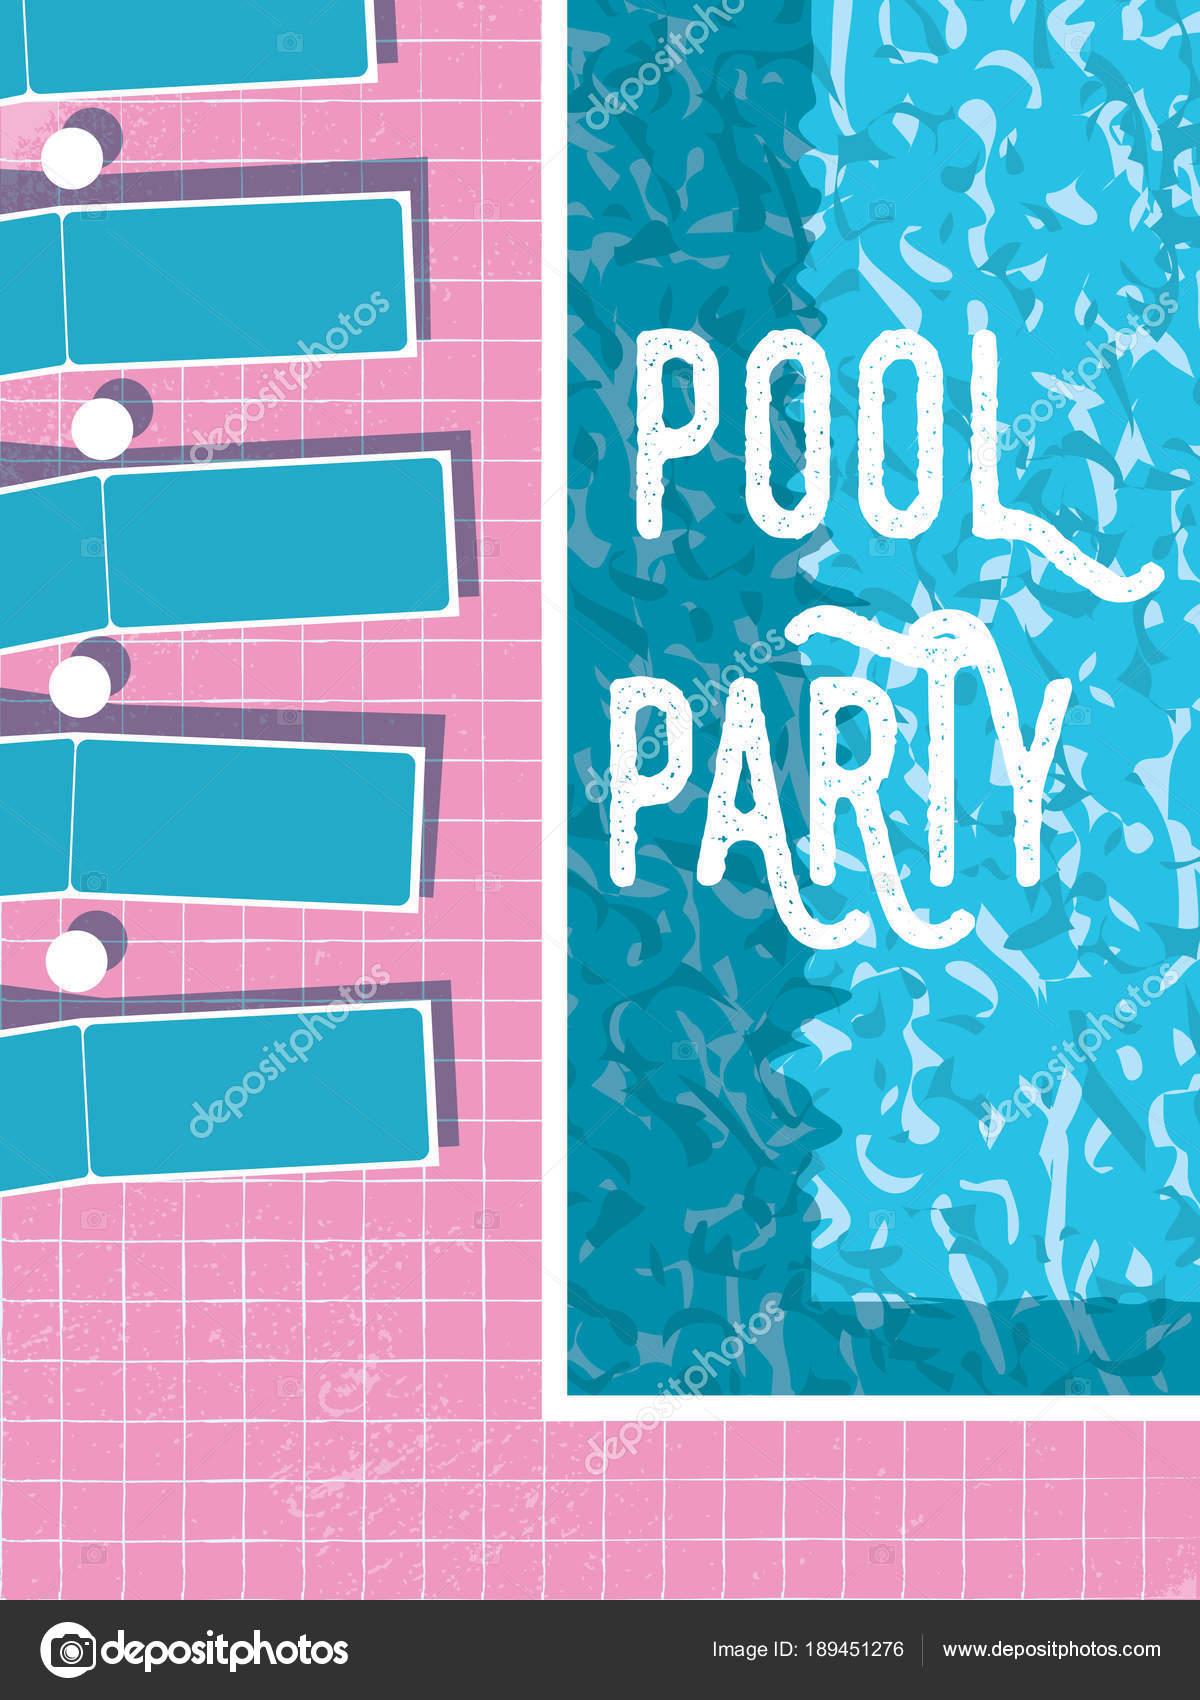 Sommer Pool Party Einladung Plakat, Flyer Vektor Vorlage mit ...